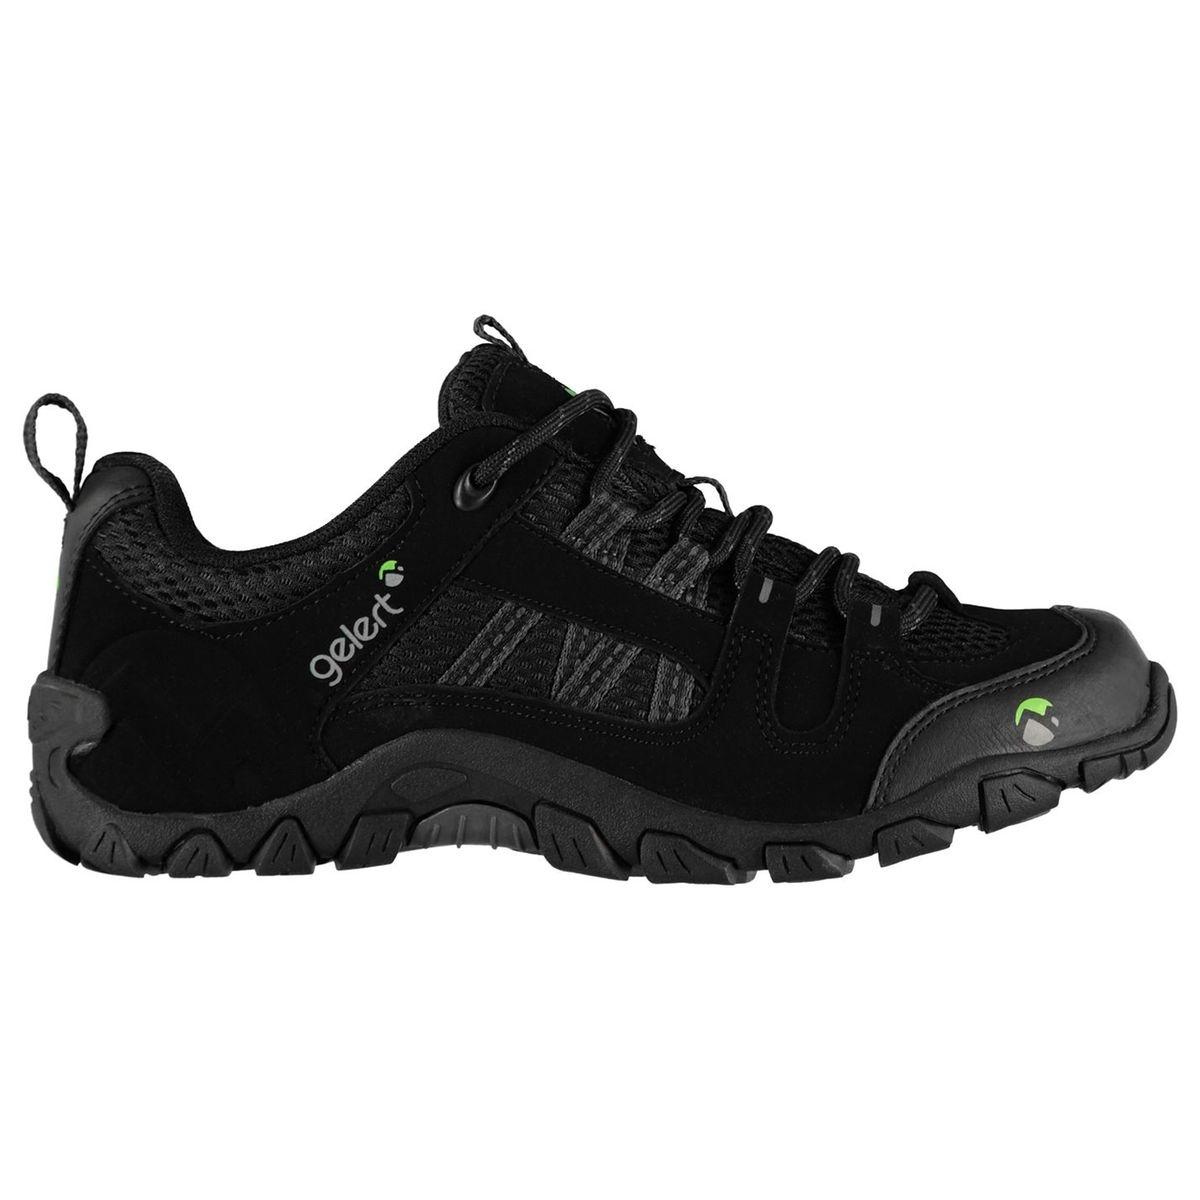 Chaussures de marche respirantes